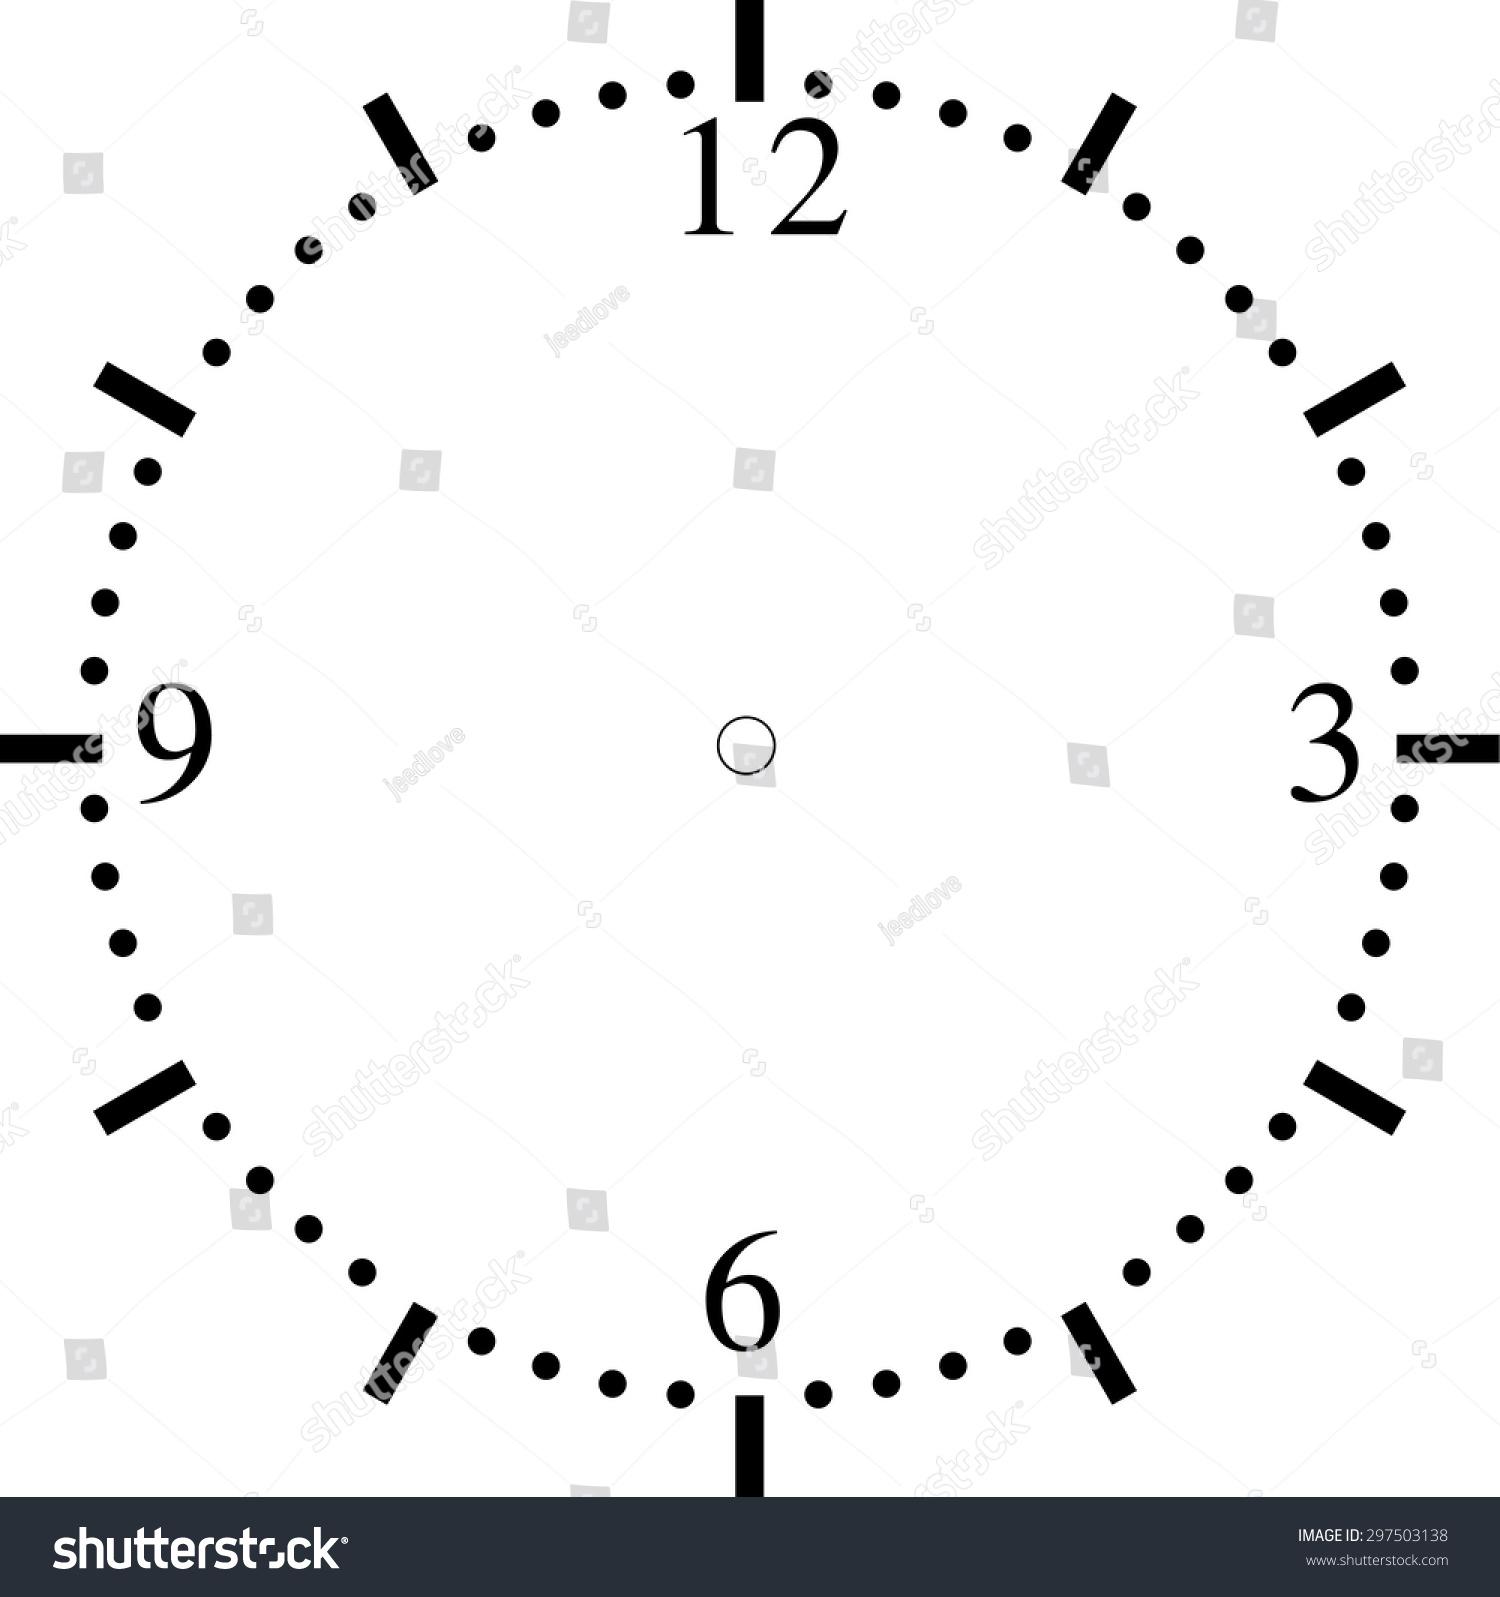 worksheet Clock Blank clock face blank stock vector 297503138 shutterstock blank